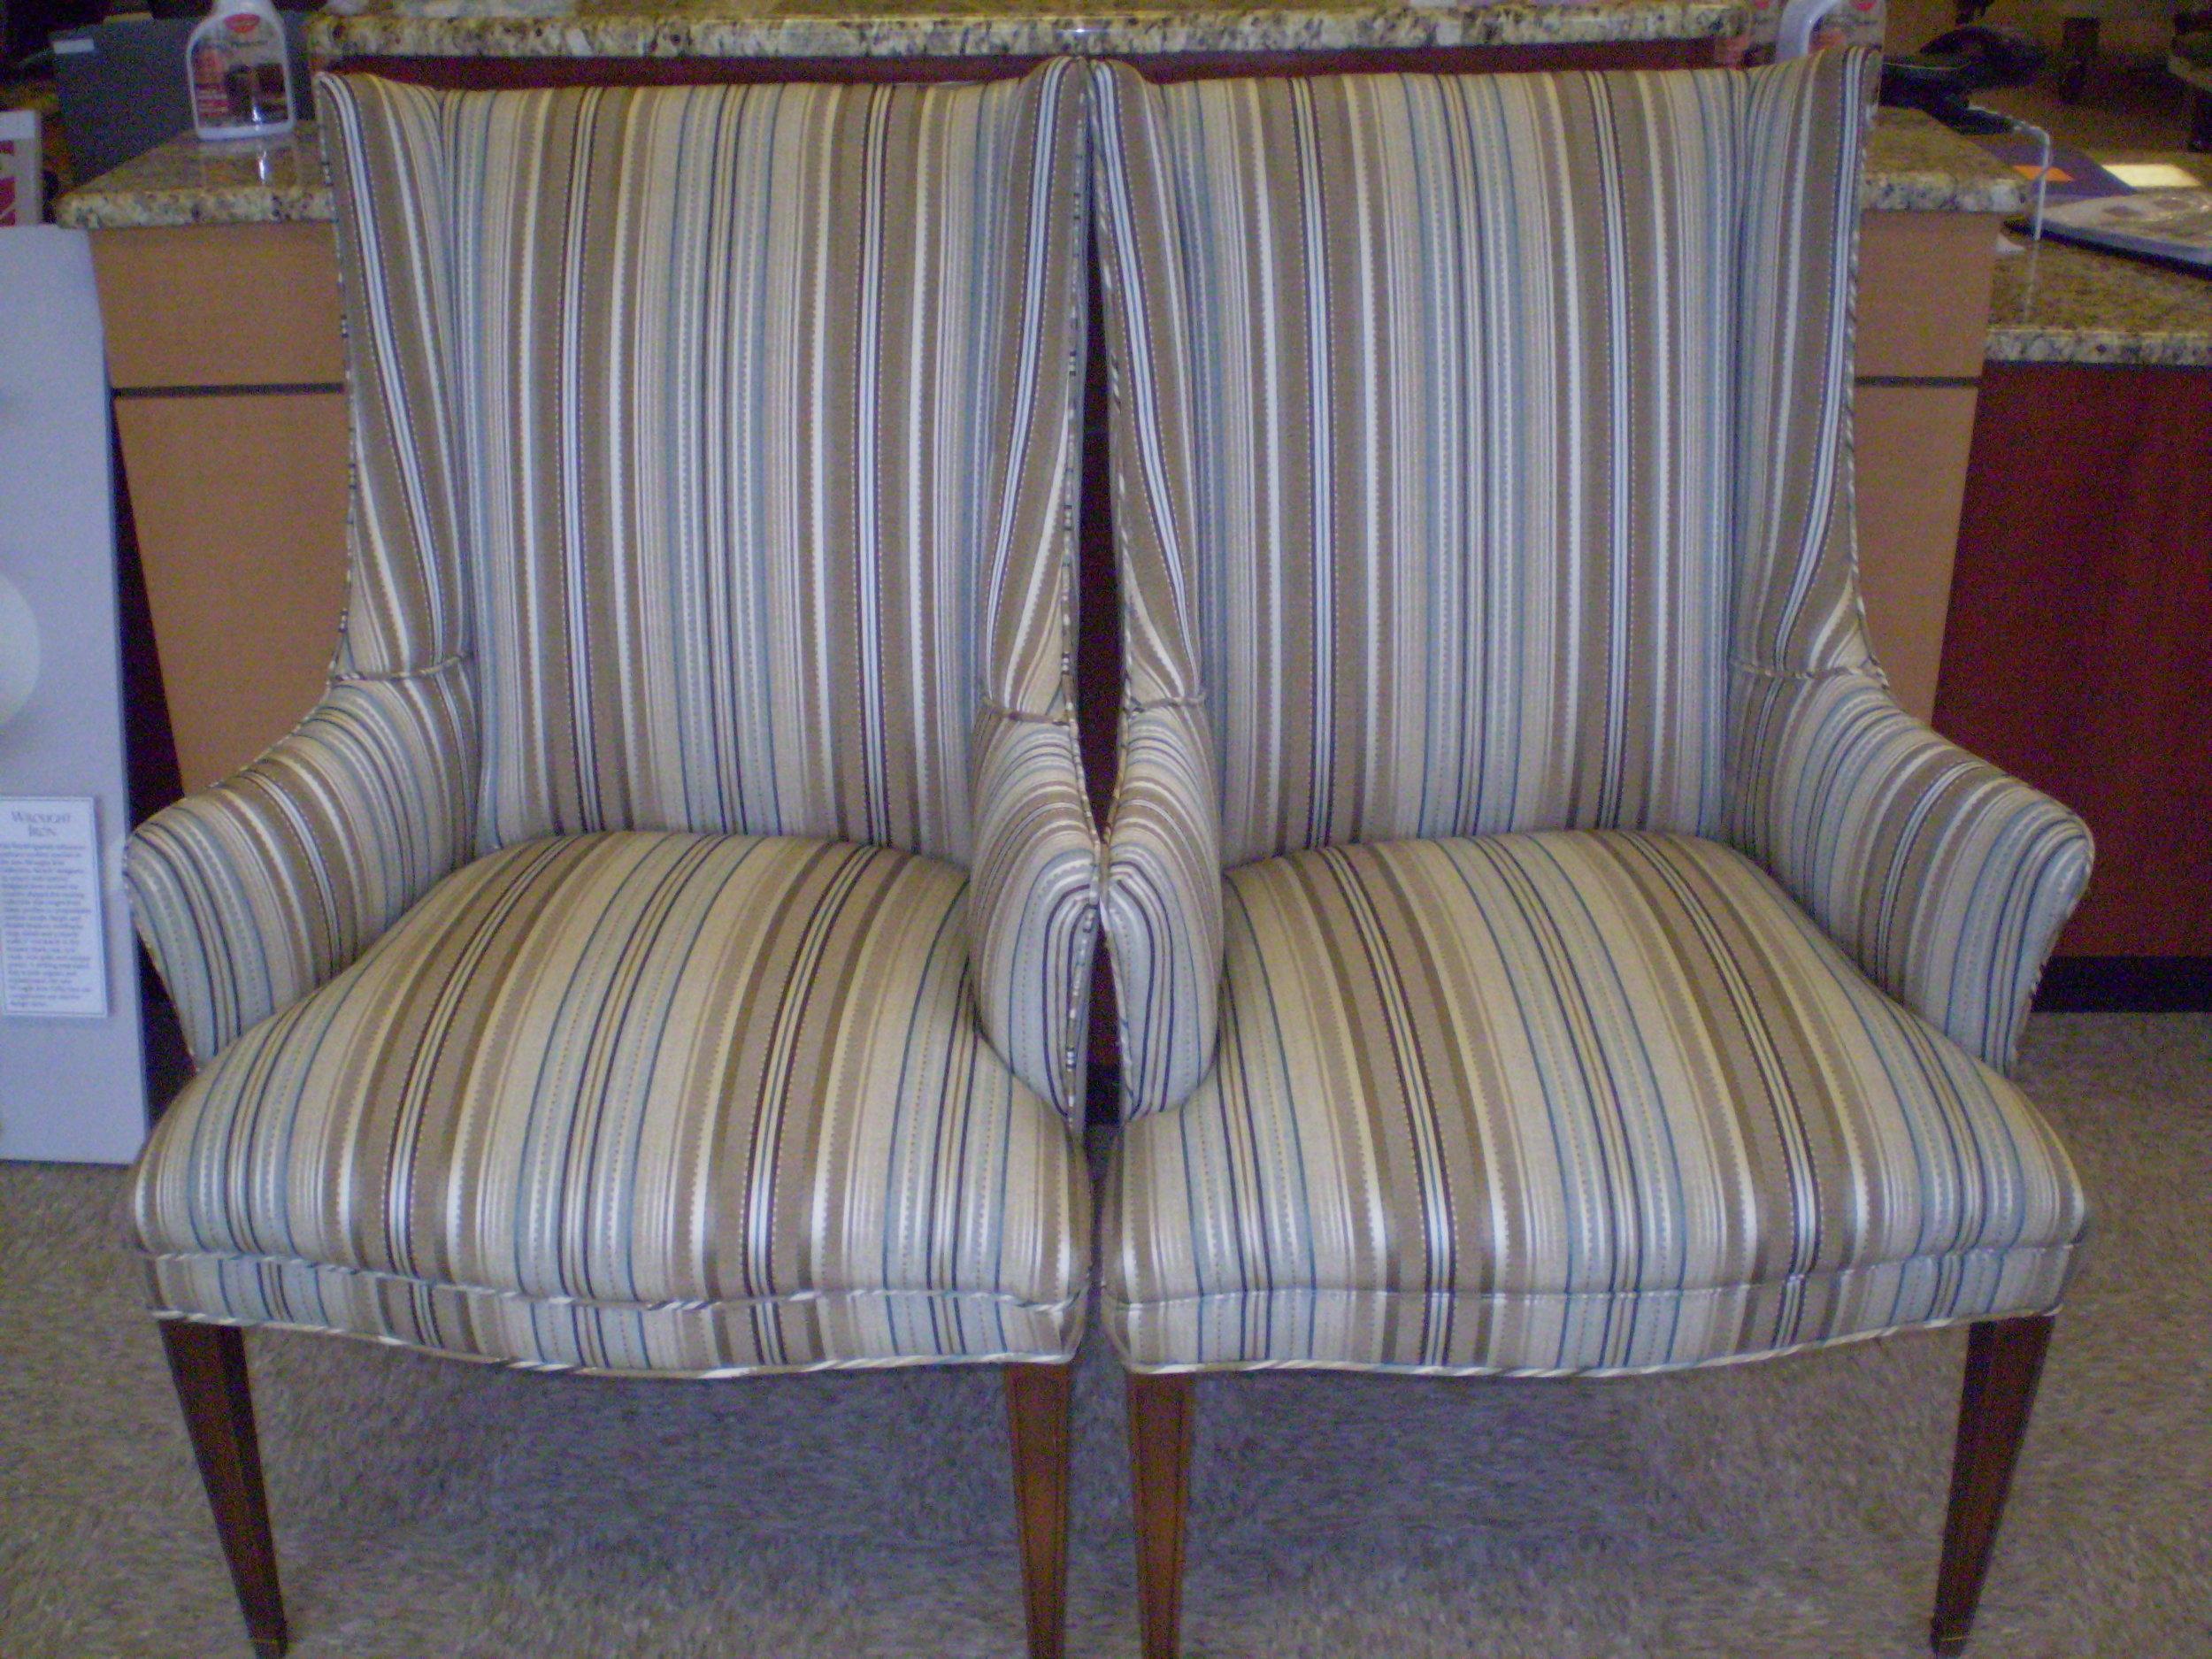 custom-furniture-upholstery-design-atlanta-georgia-3.JPG